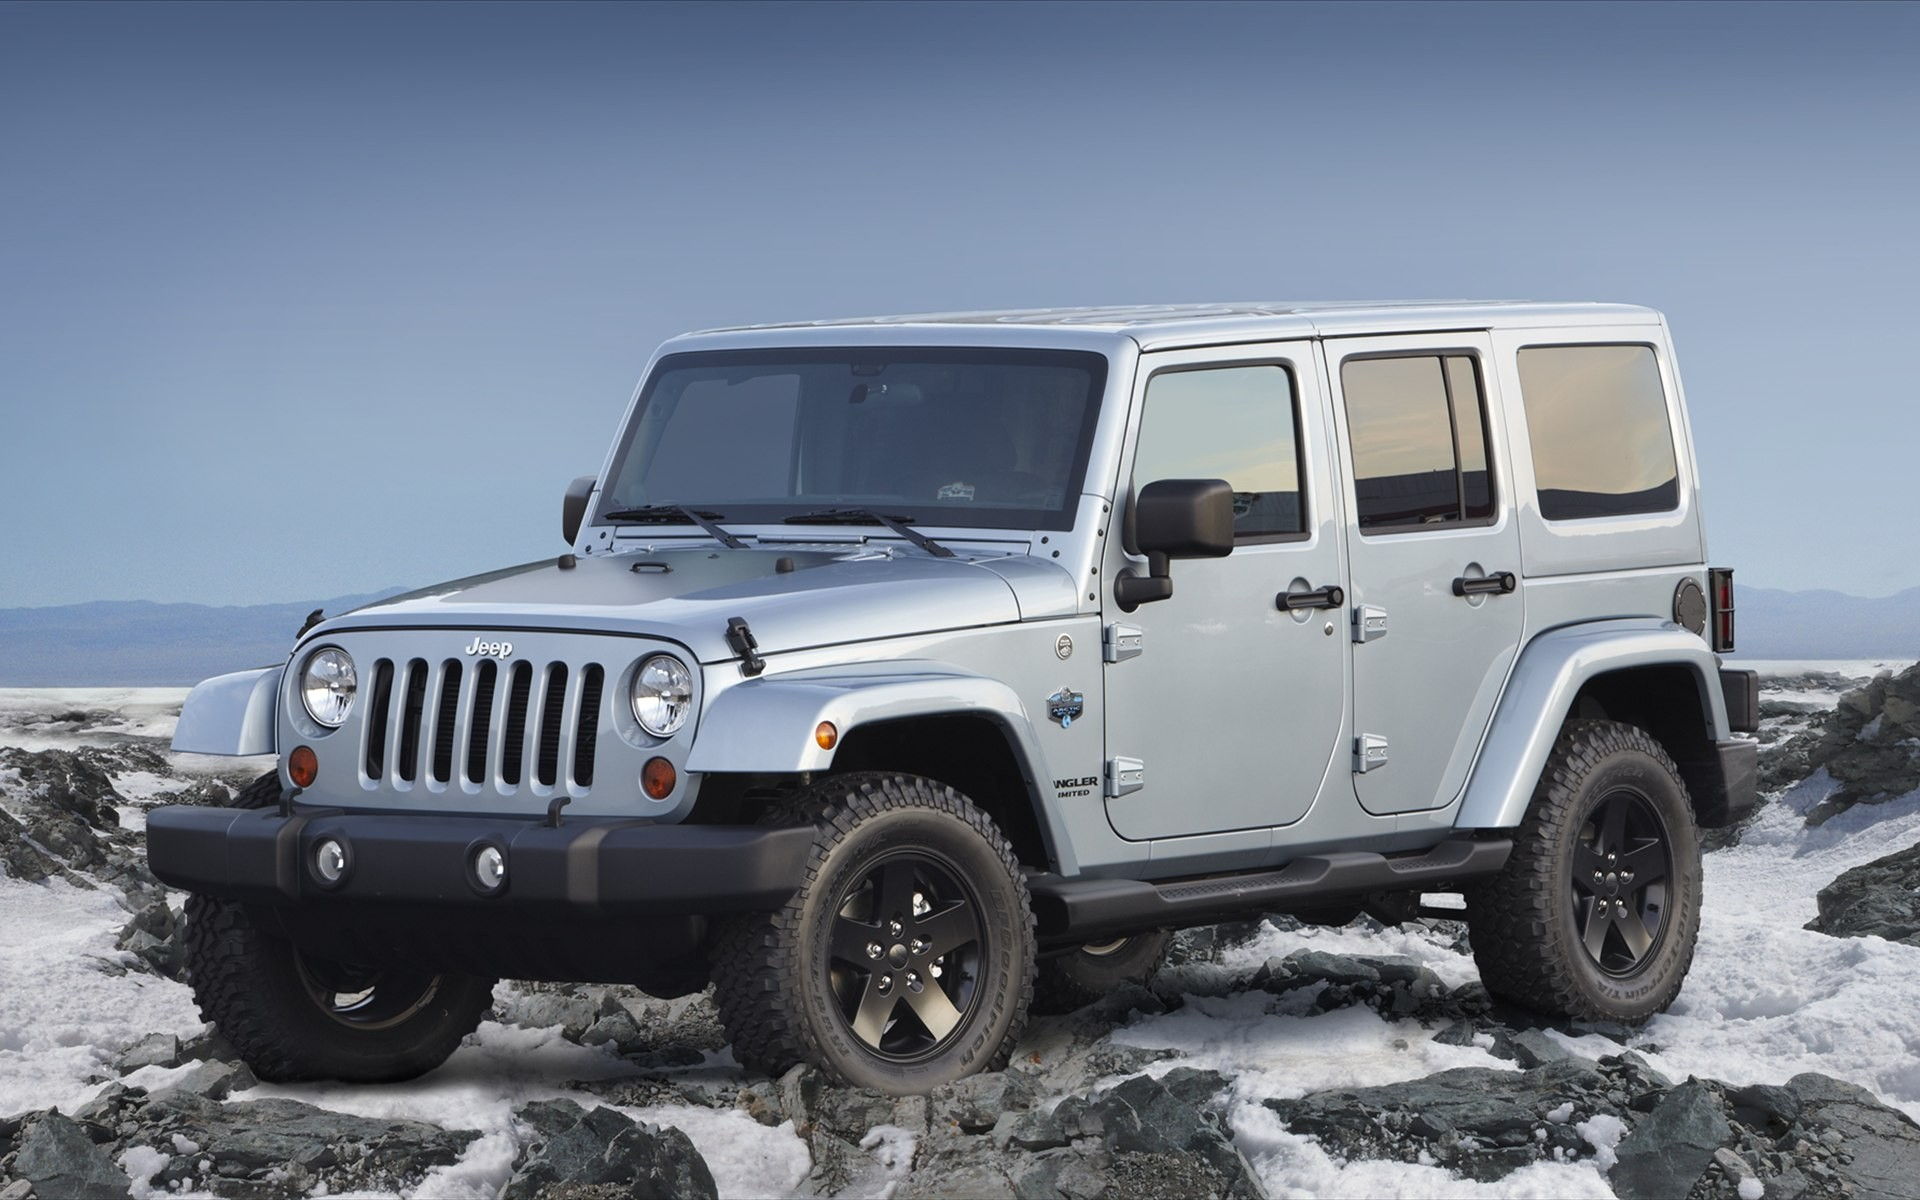 Jeep Car Images Hd: 2012 Jeep Wrangler Unlimited Arctic Wallpaper